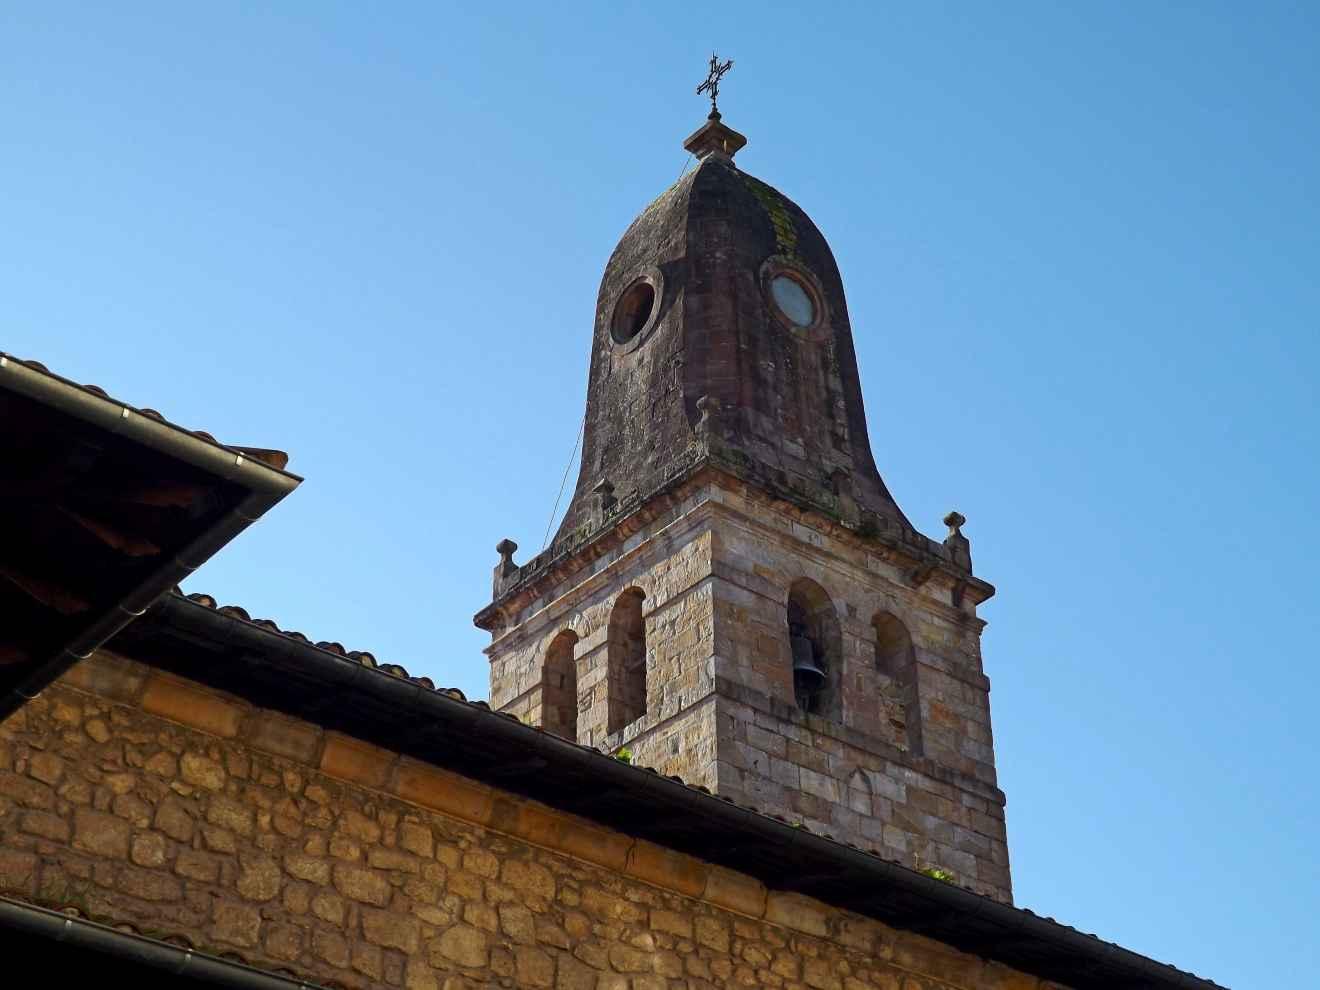 Chapitel de San Martín de Cabezón